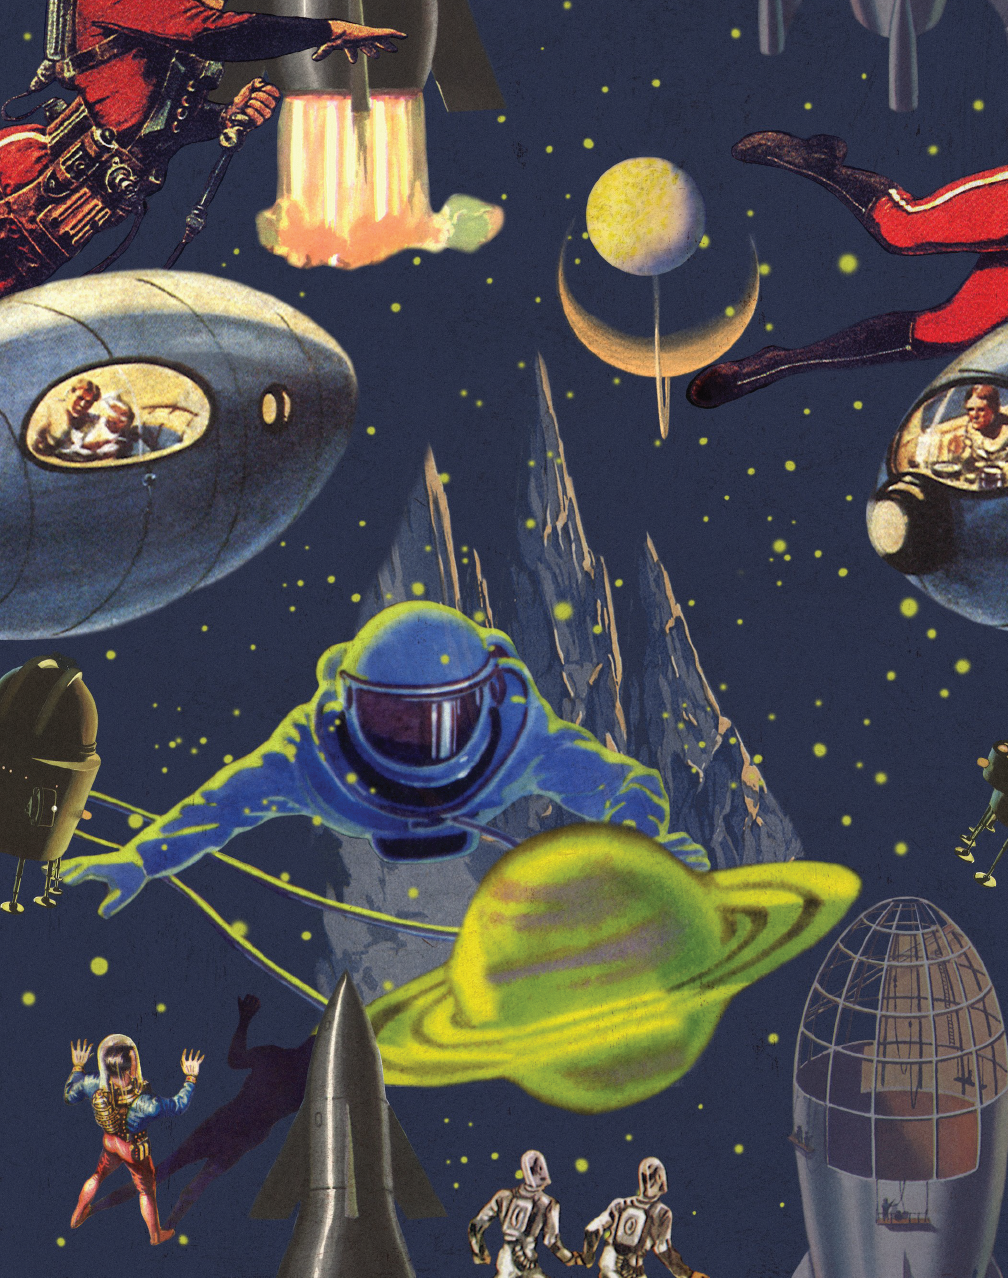 Intergalactic Wallpaper wallpapers in 2019 Wallpaper decor 1008x1278